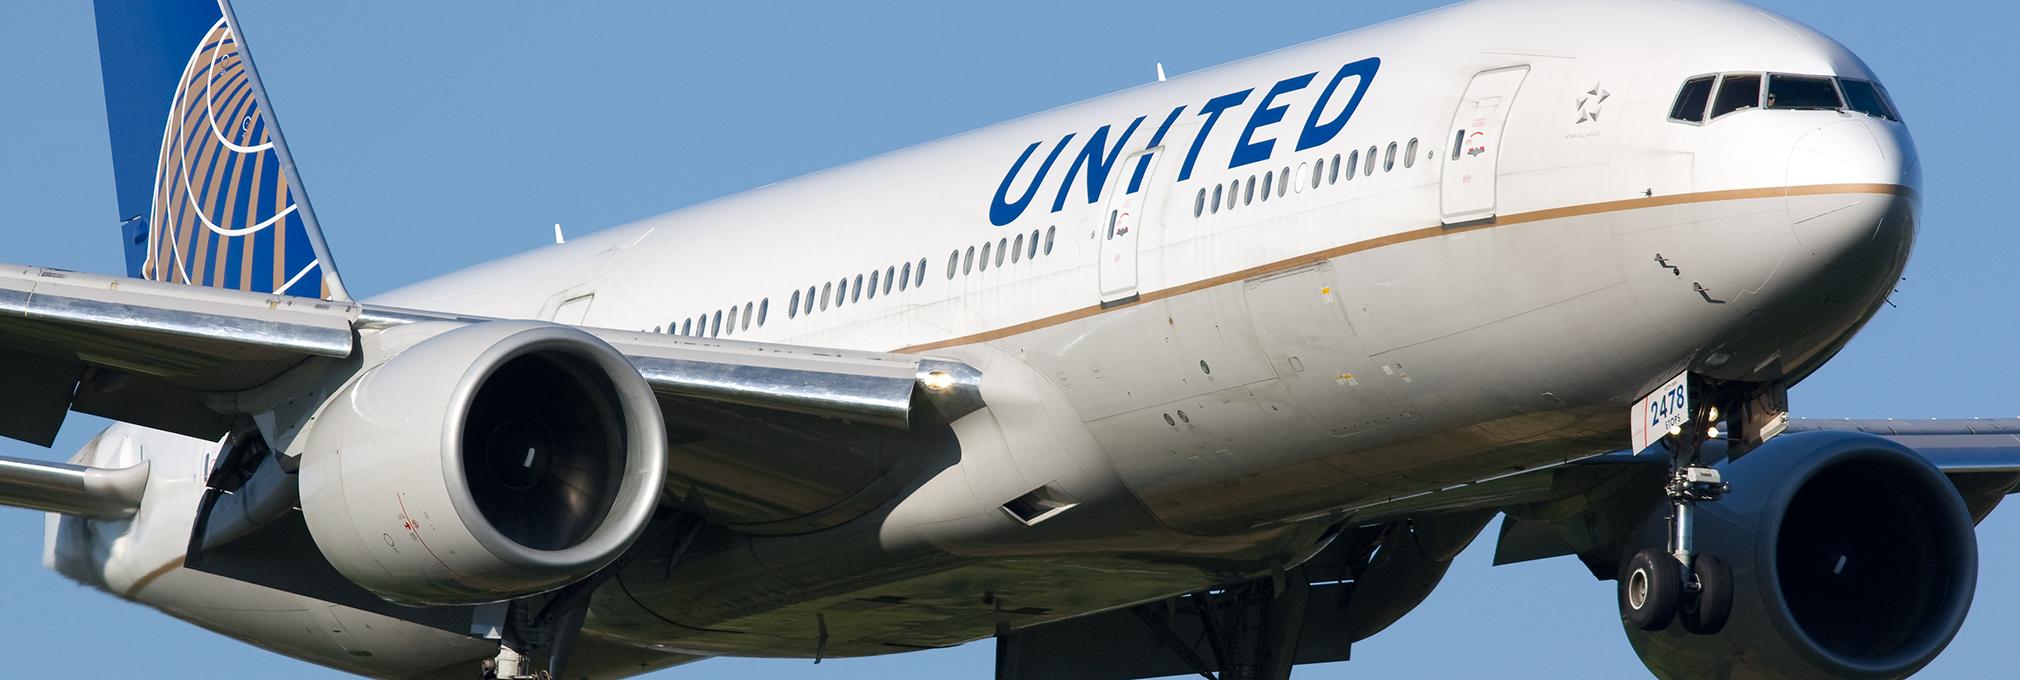 United Airlines Ratings and Flights - TripAdvisor